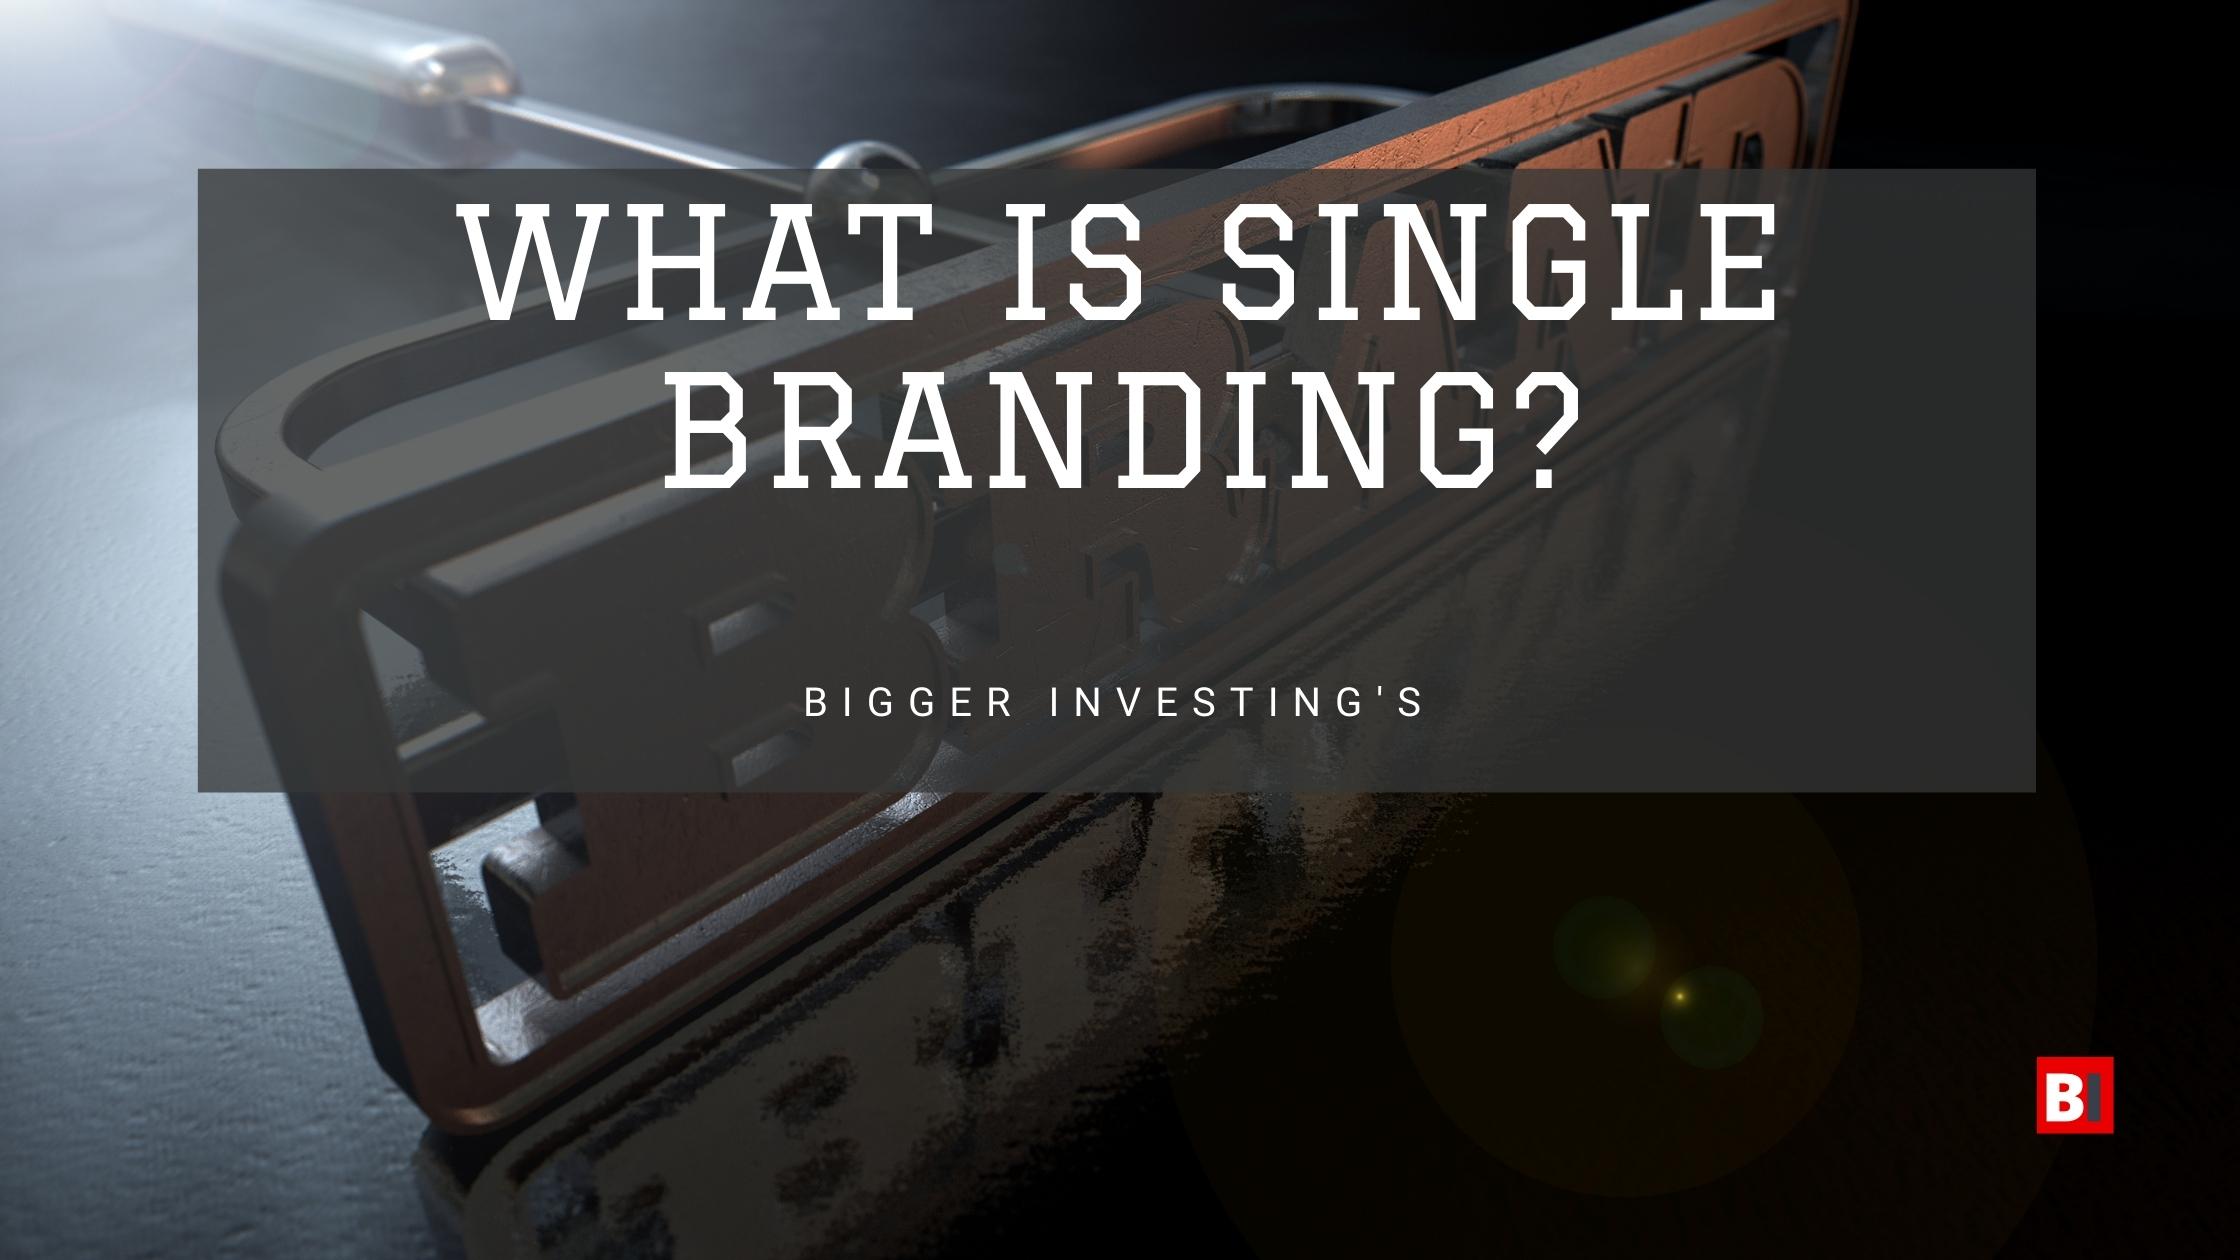 What is Single Branding?